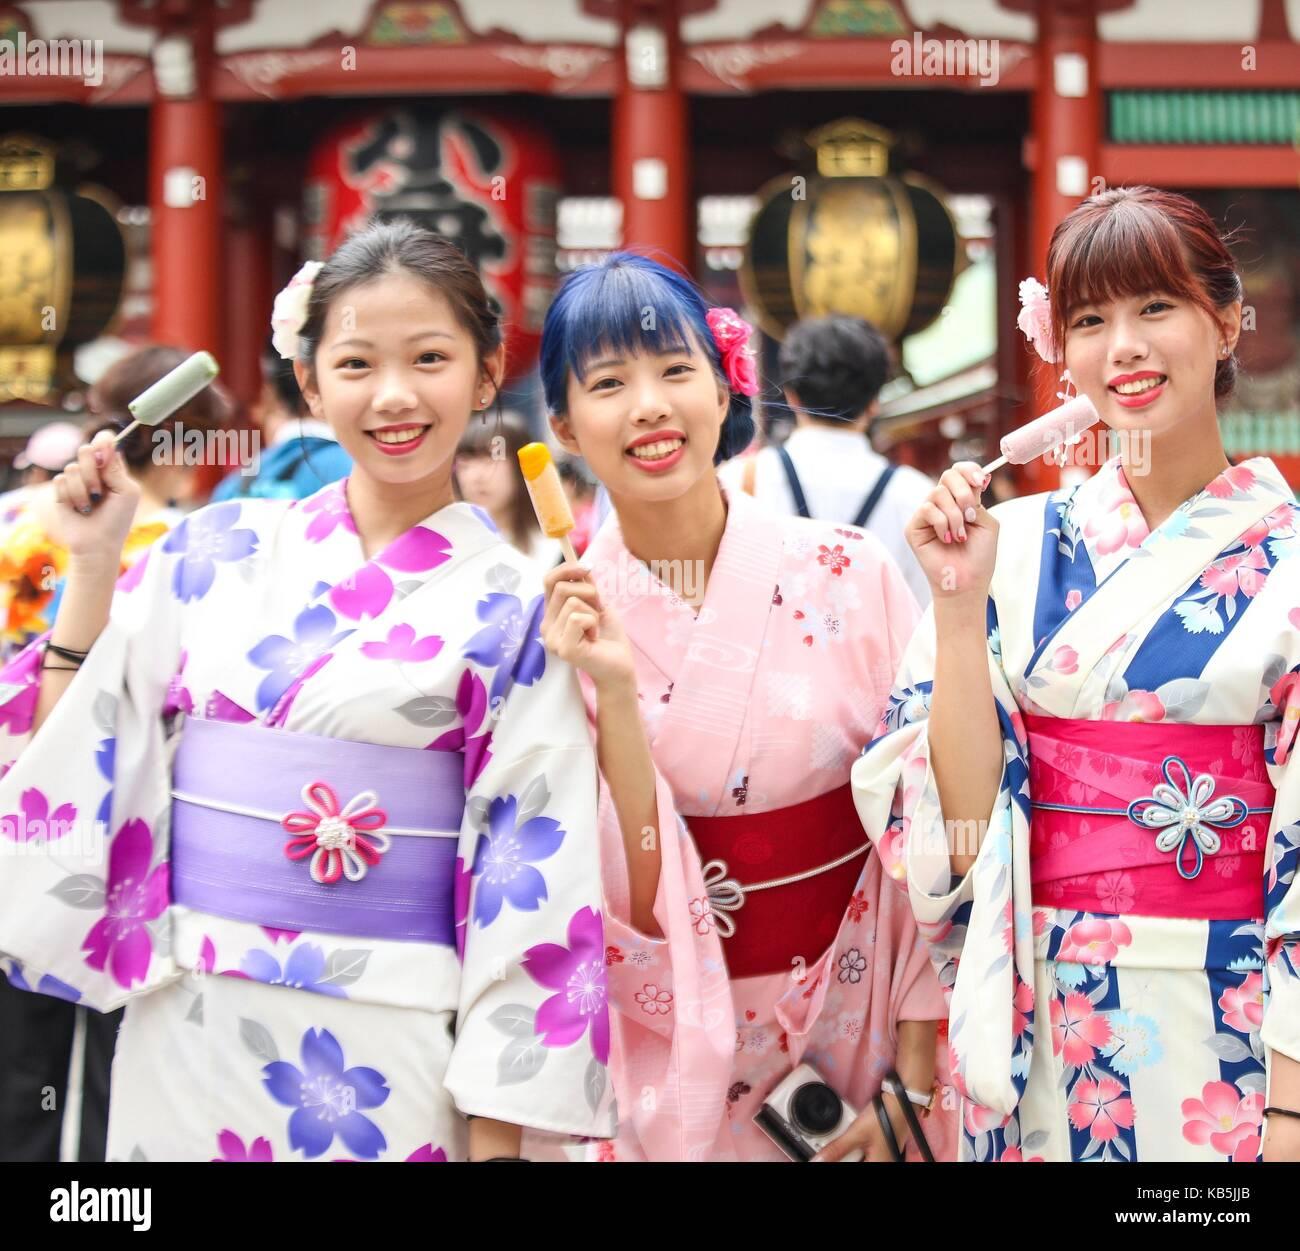 Kanda japanese teen